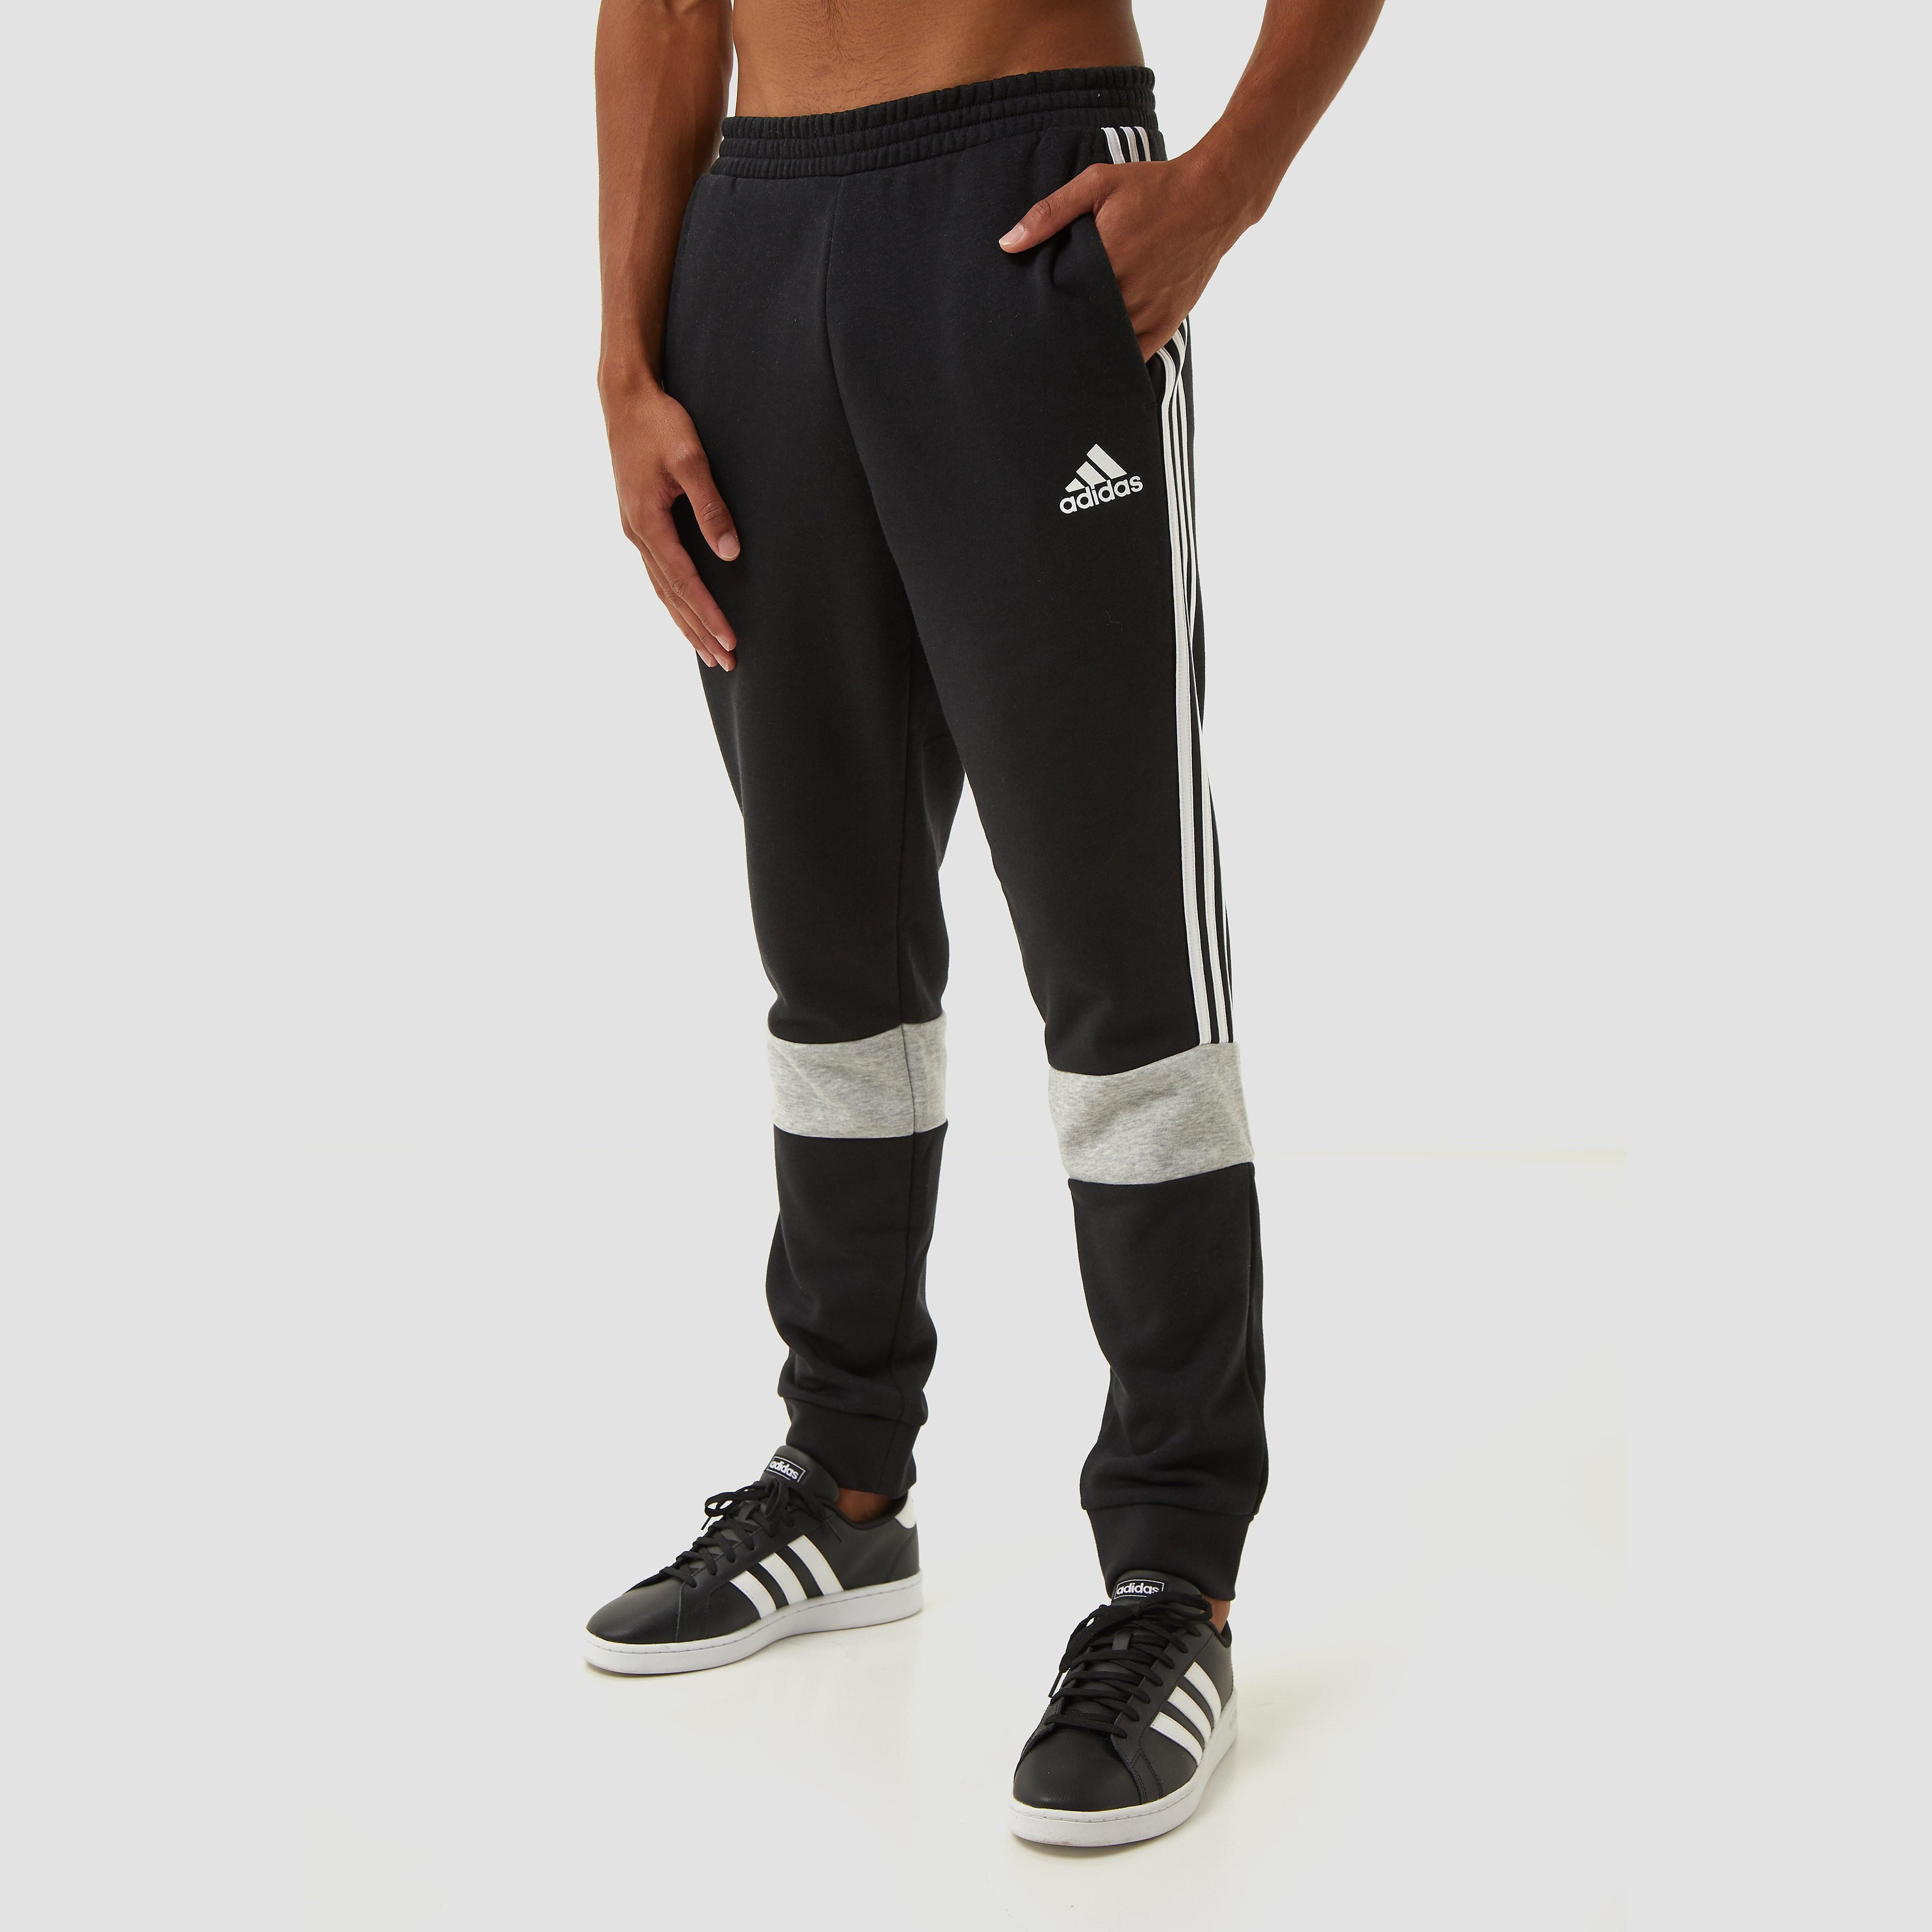 NU 20% KORTING: adidas Performance joggingbroek